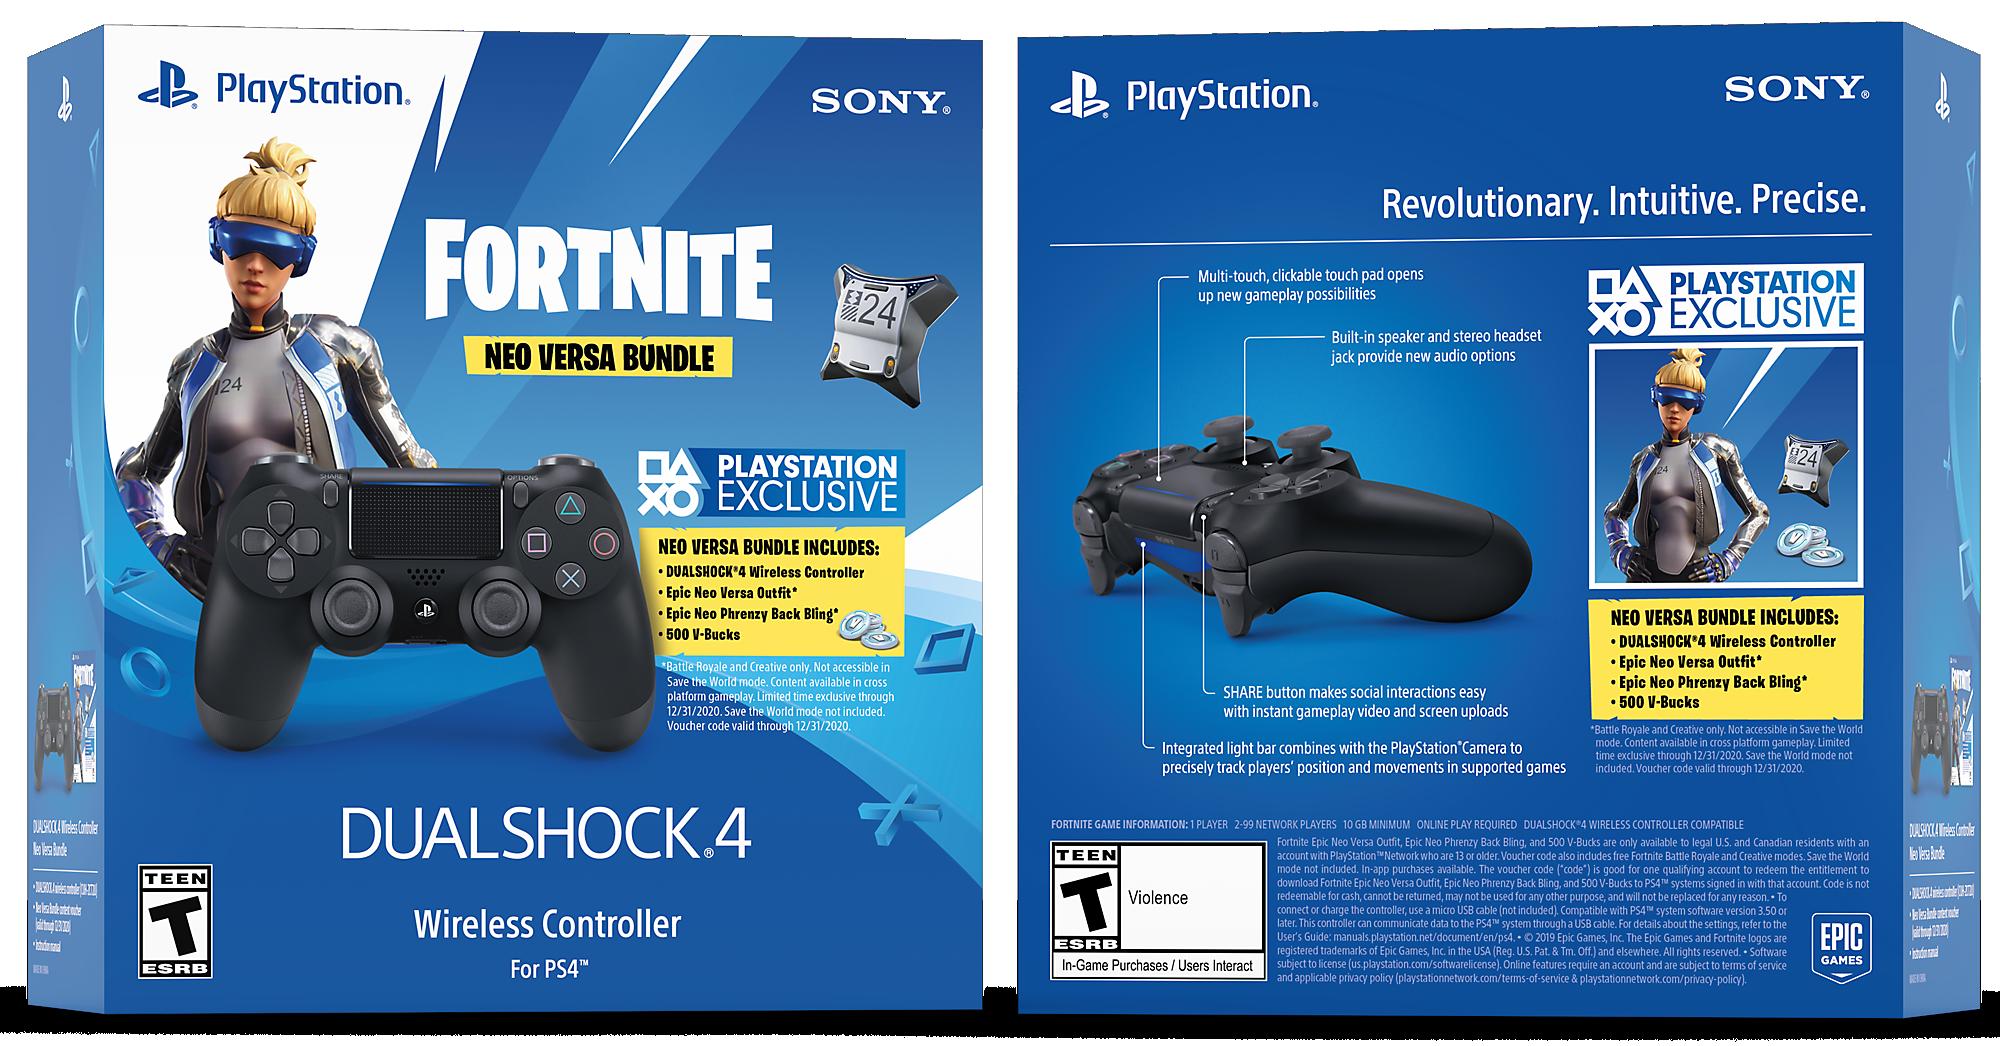 Fortnite Neo Versa Dualshock4 Wireless Controller Bundle